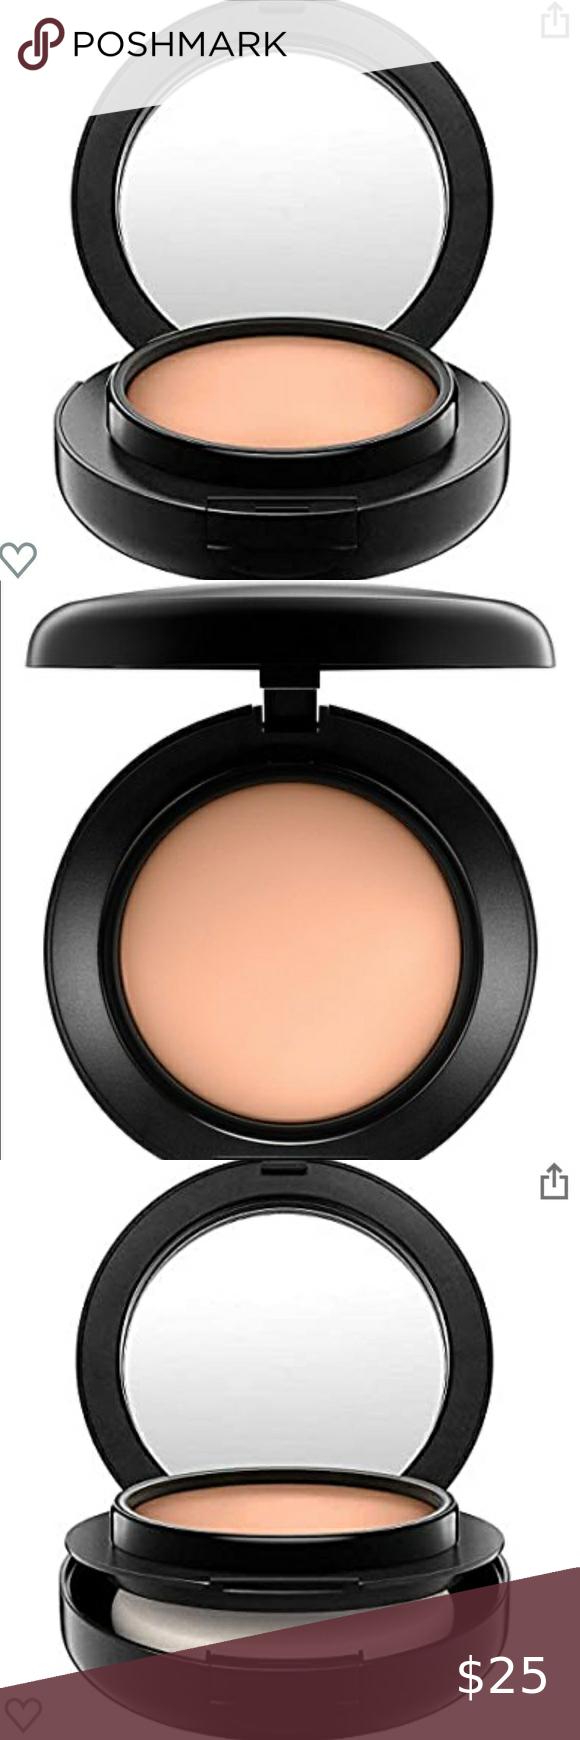 MAC Cosmetics studio tech foundation compact NW25 in 2020